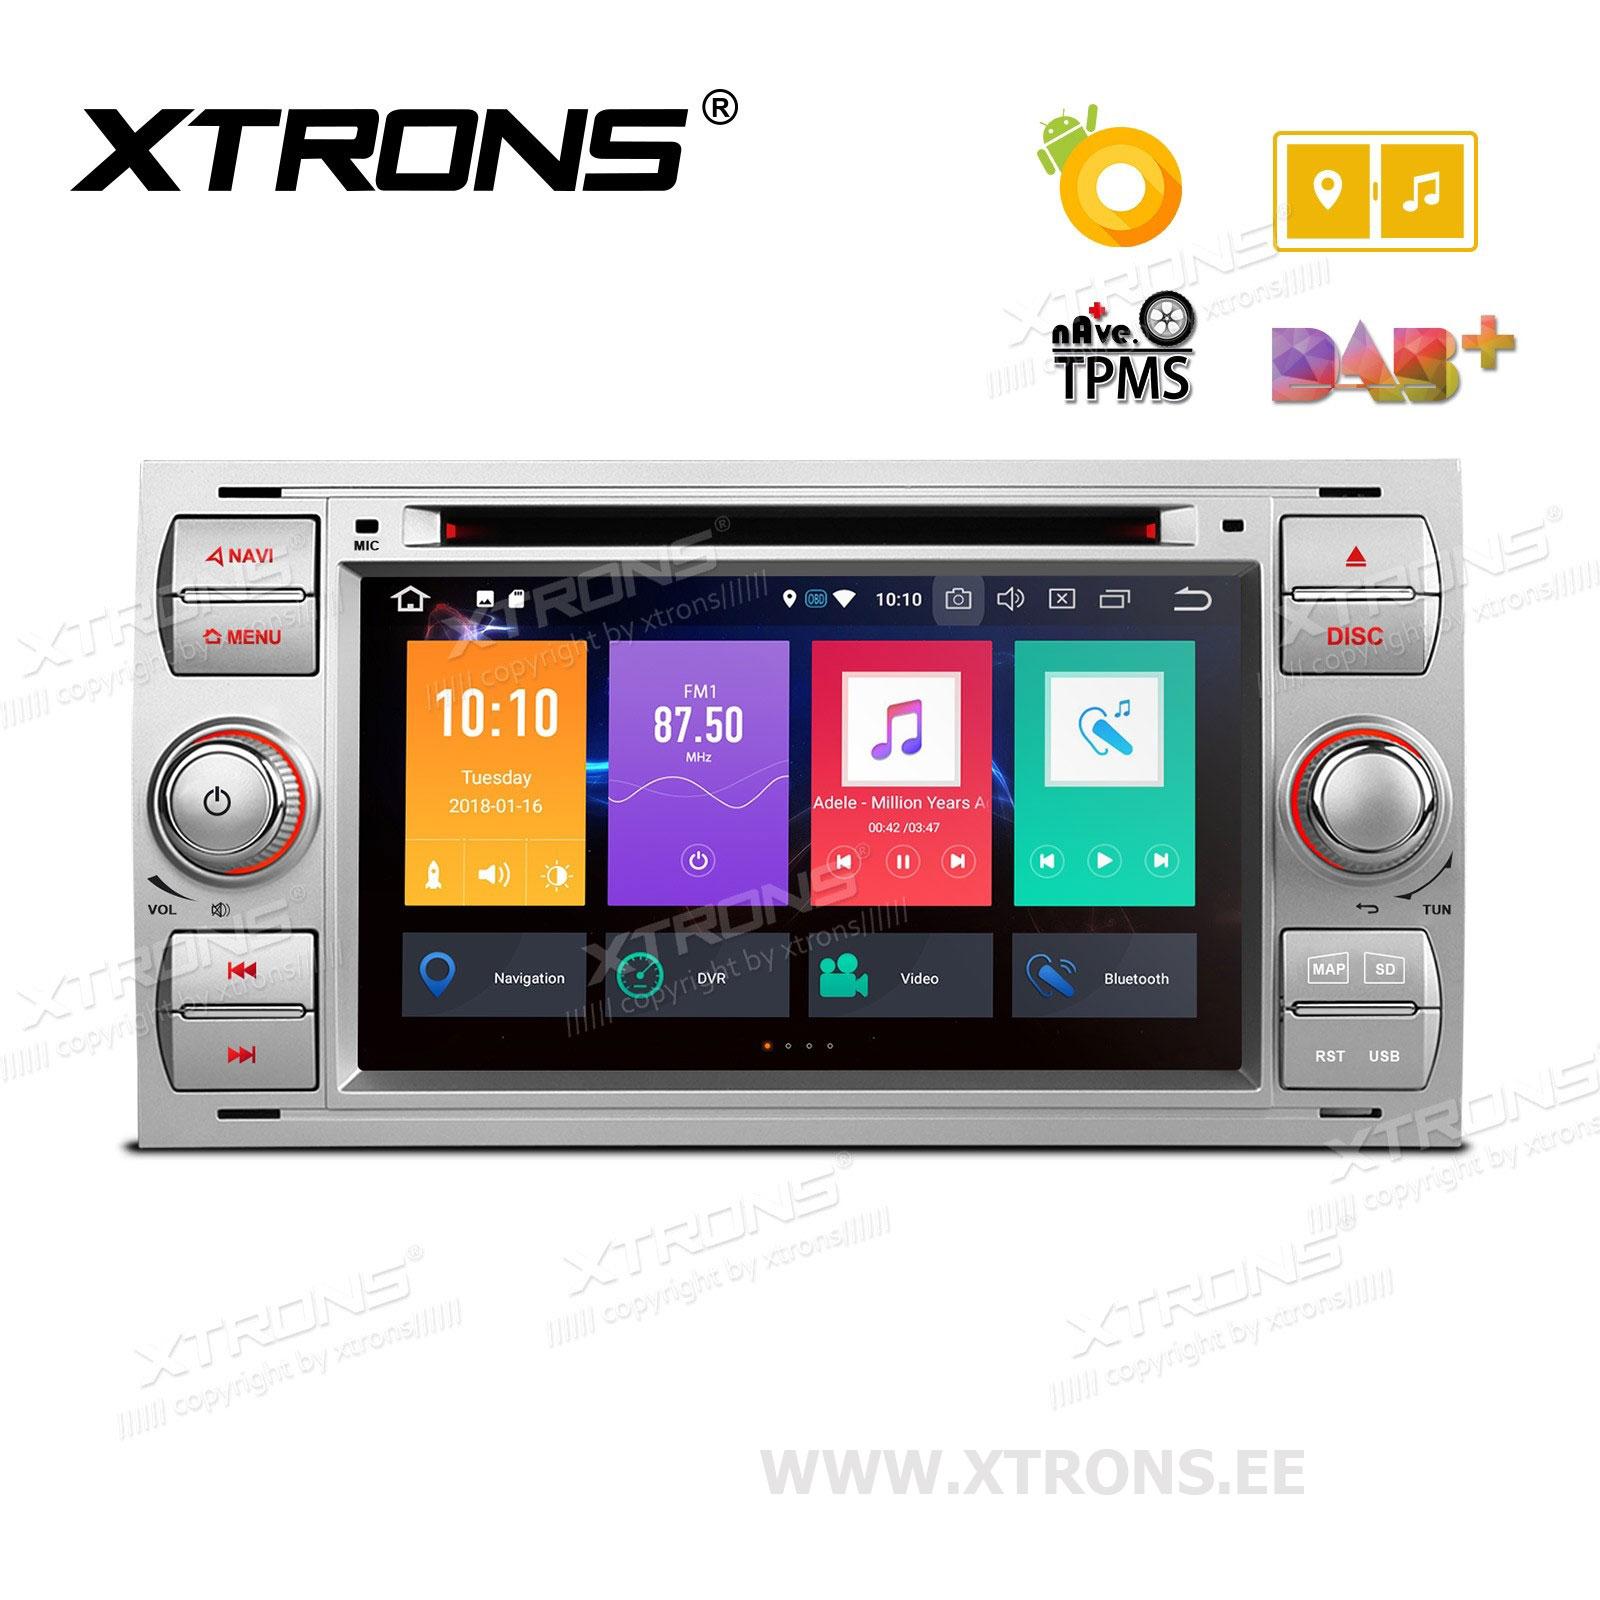 XTRONS PB78QSFP-S